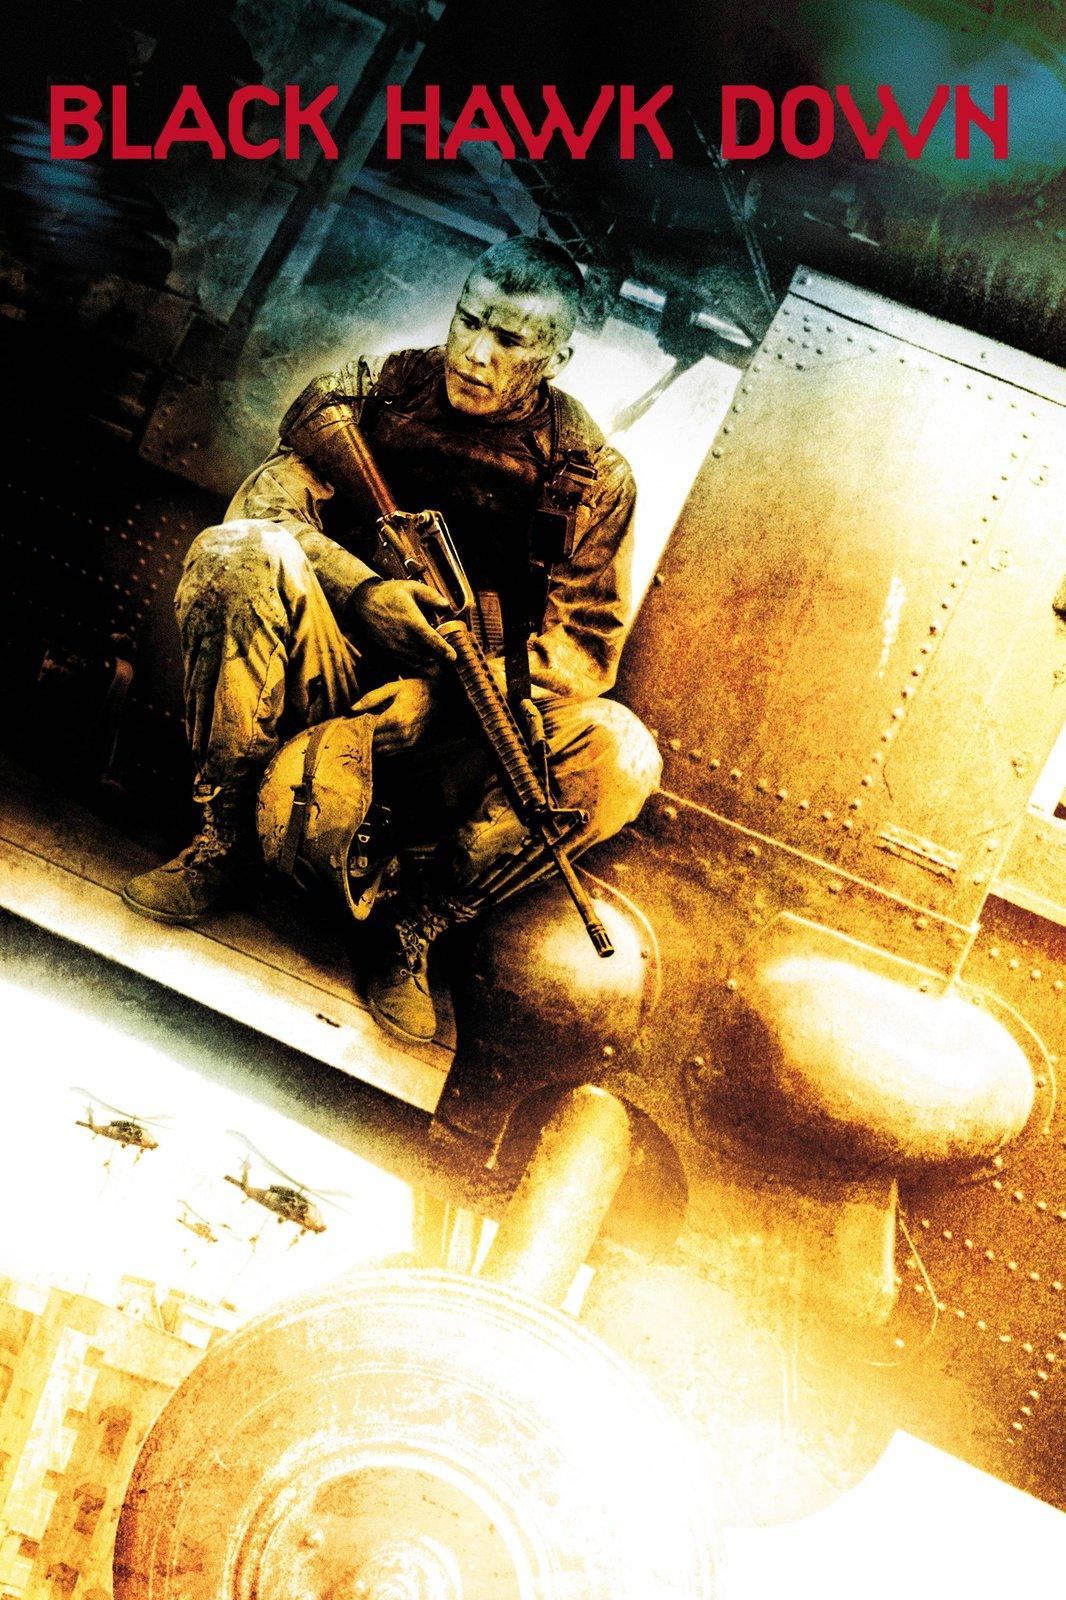 Rockstar movie ranbir kapoor mp3 songs free download